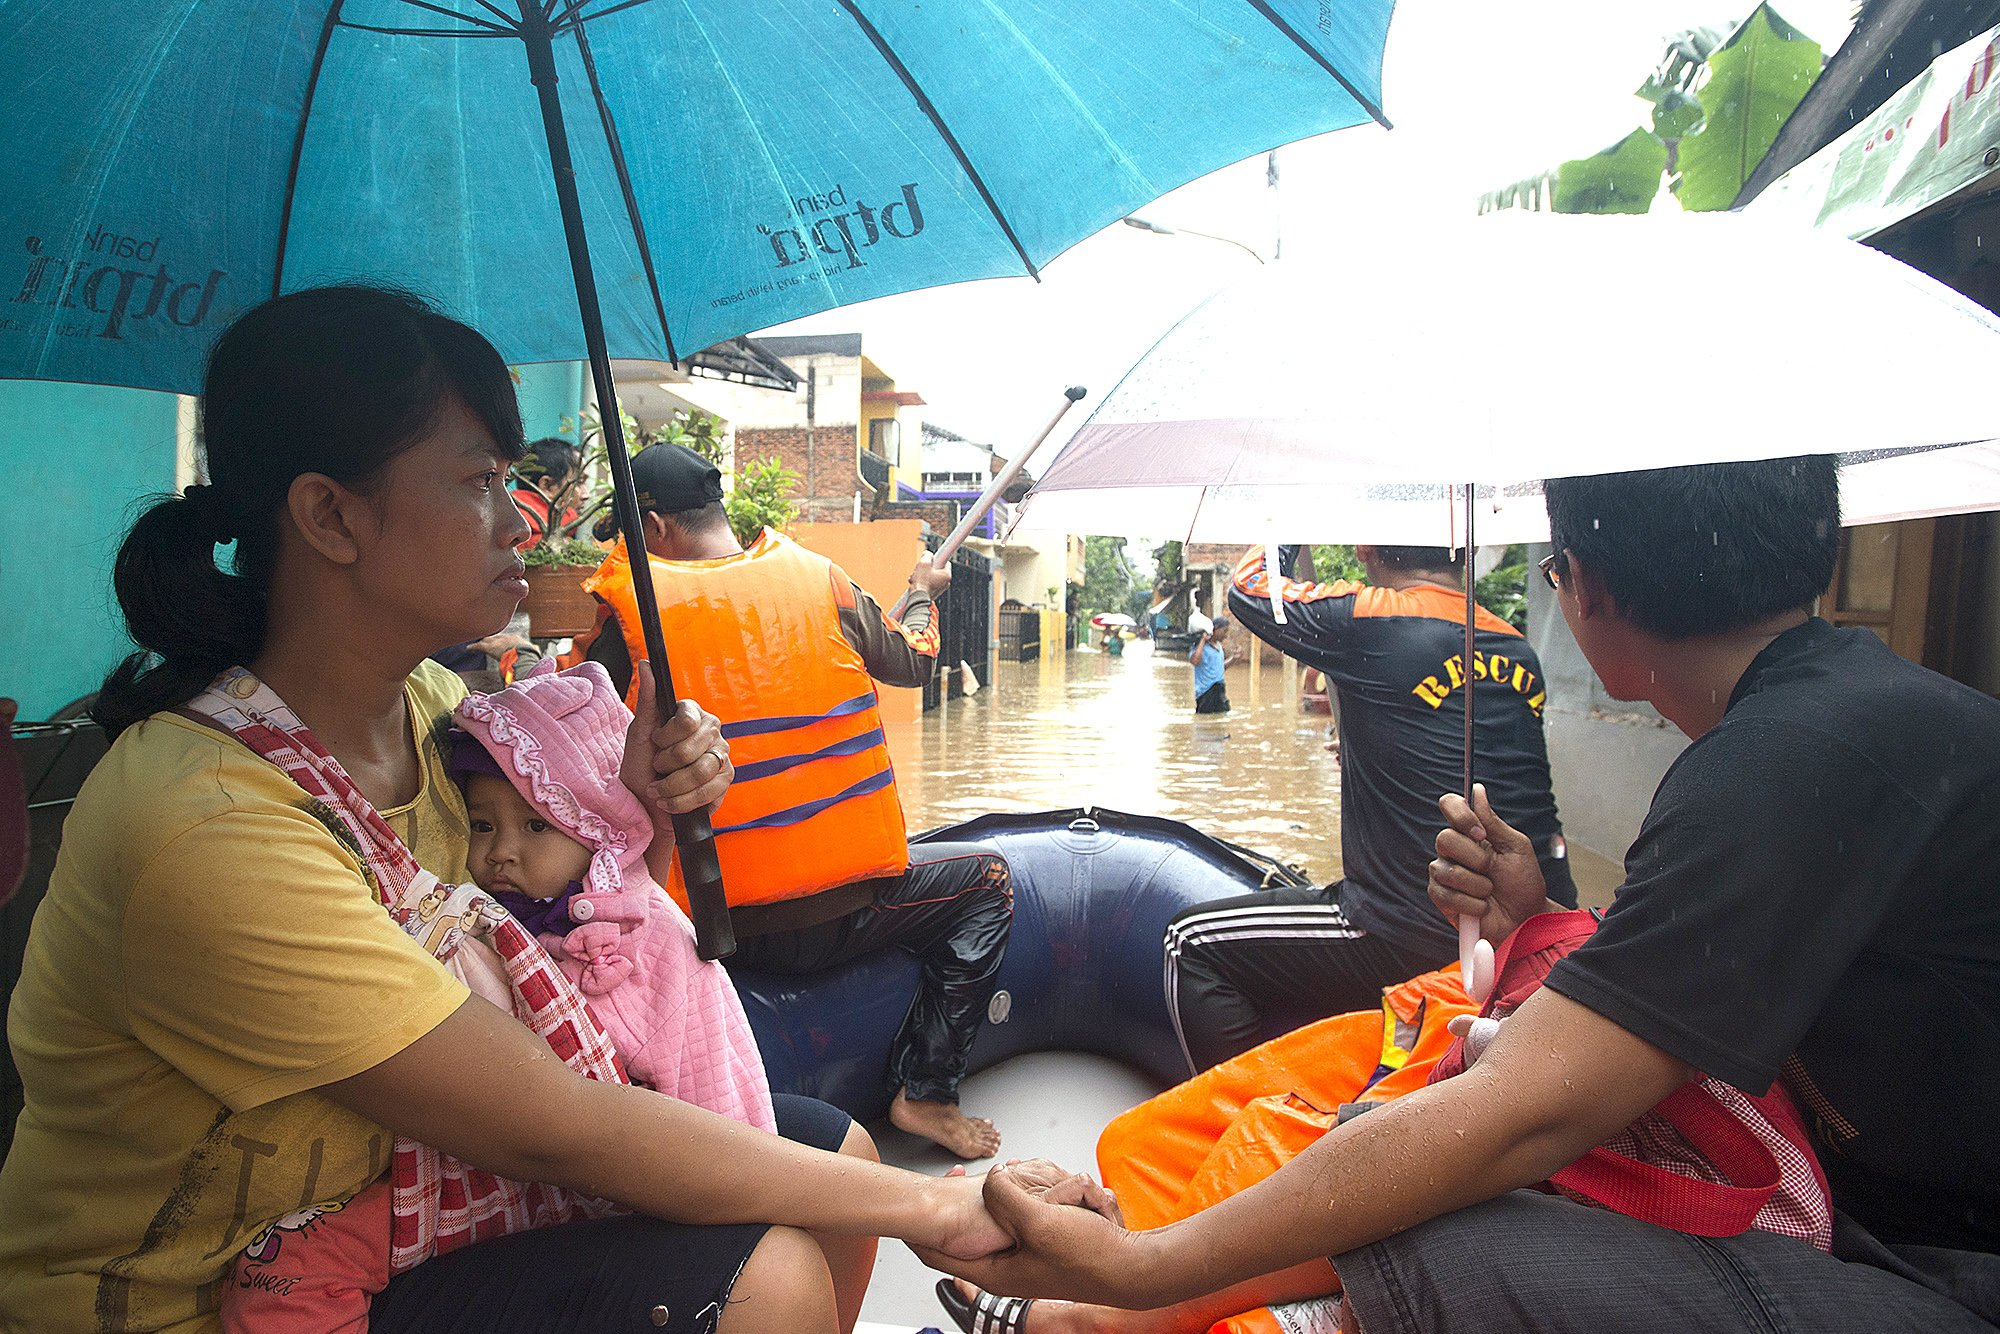 Warga menggunakan perahu untuk menuju rumahnya yang terendam banjir di Kelurahan Cipinang Melayu, Kecamatan Makassar, Jakarta, Senin (20/2). Banjir yang terjadi di kawasan tersebut akibat luapan dari Kali Sunter.